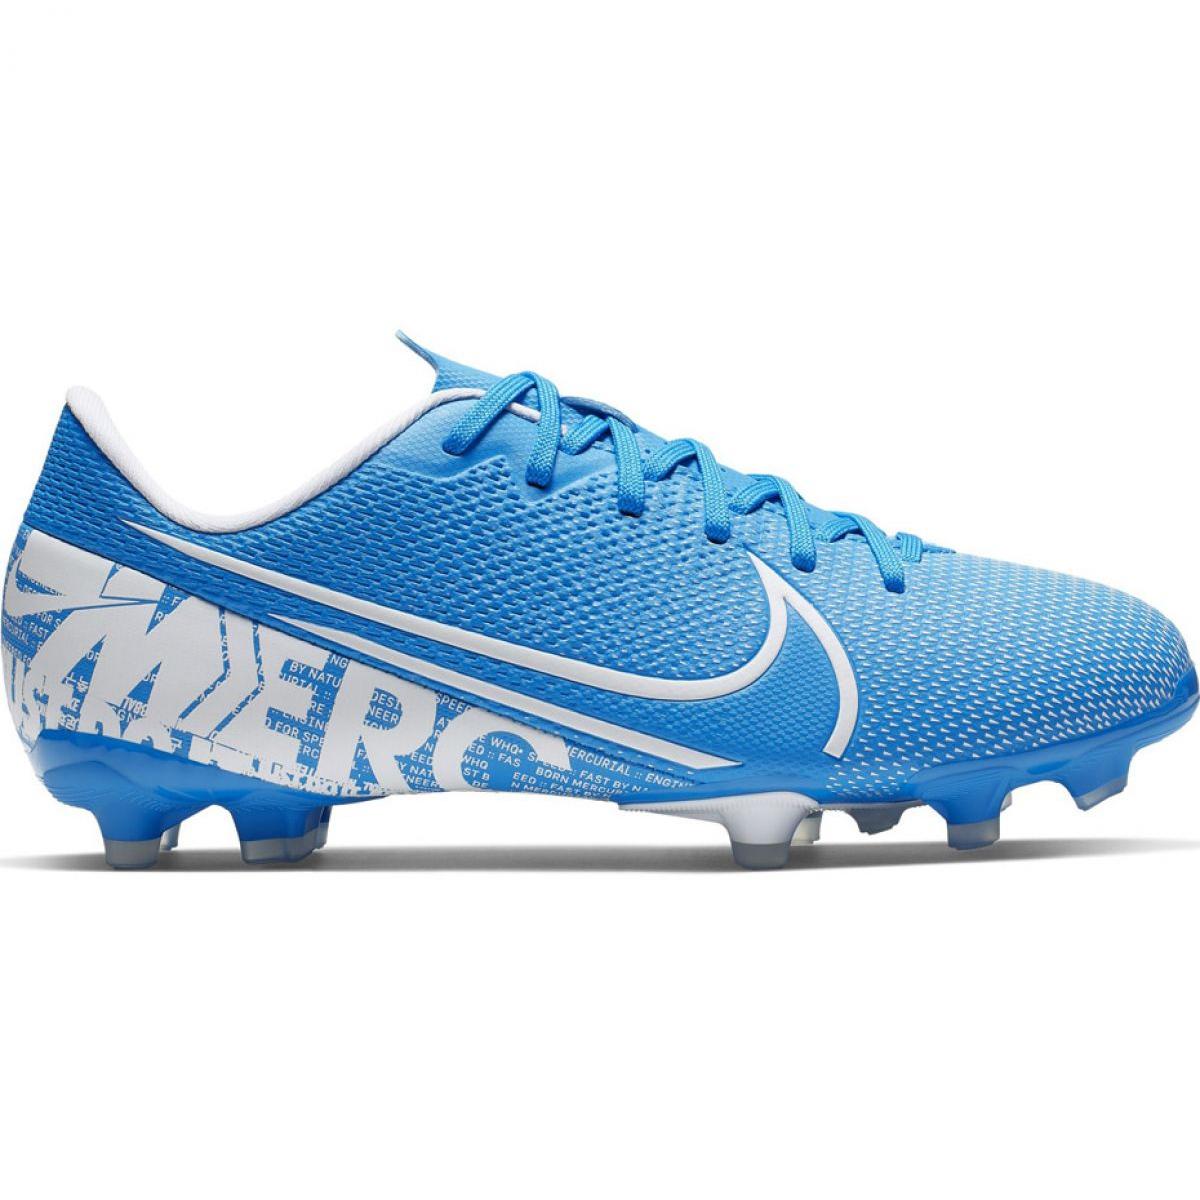 Football boots Nike Mercurial Vapor 13